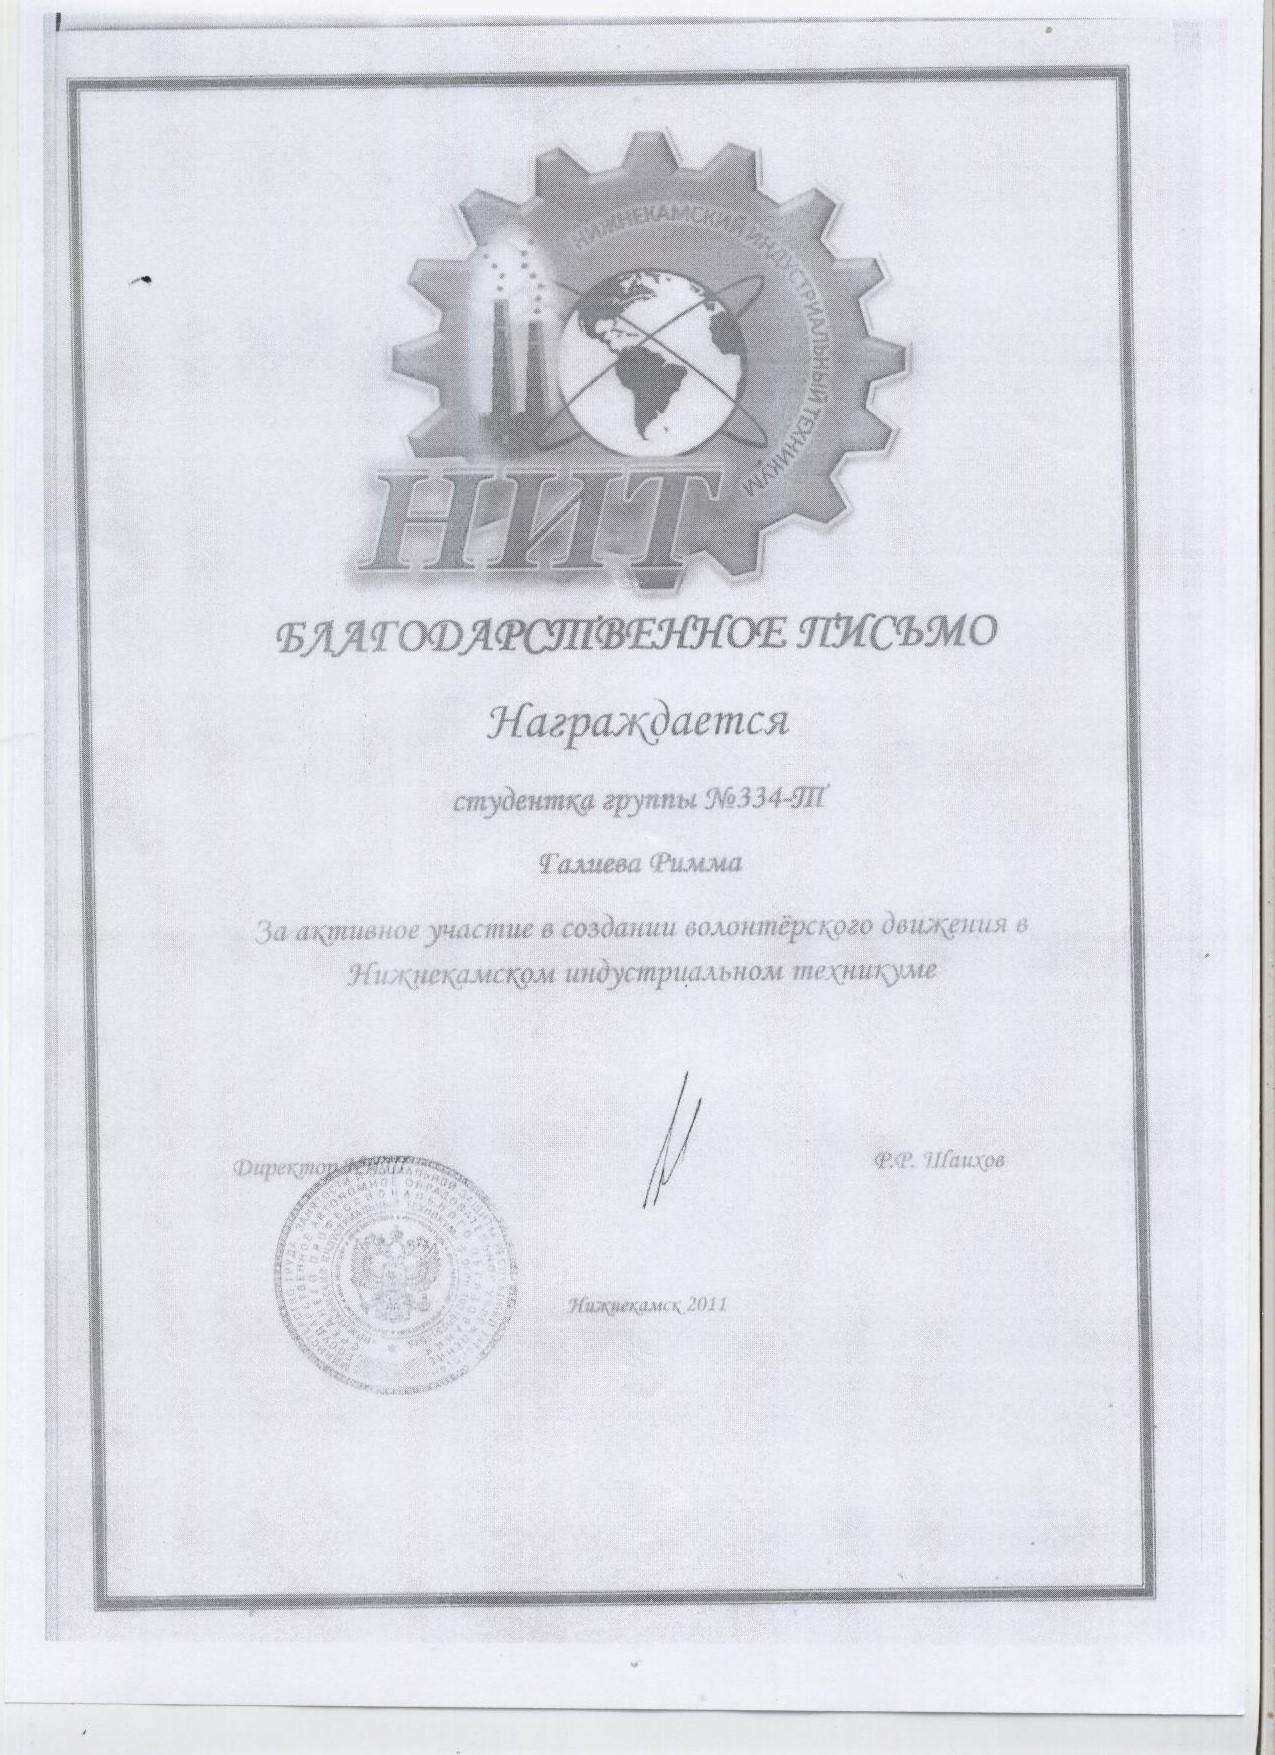 F:\Всероссйский конкурс Портфолио выпускника\РИММА\Римма 009.jpg